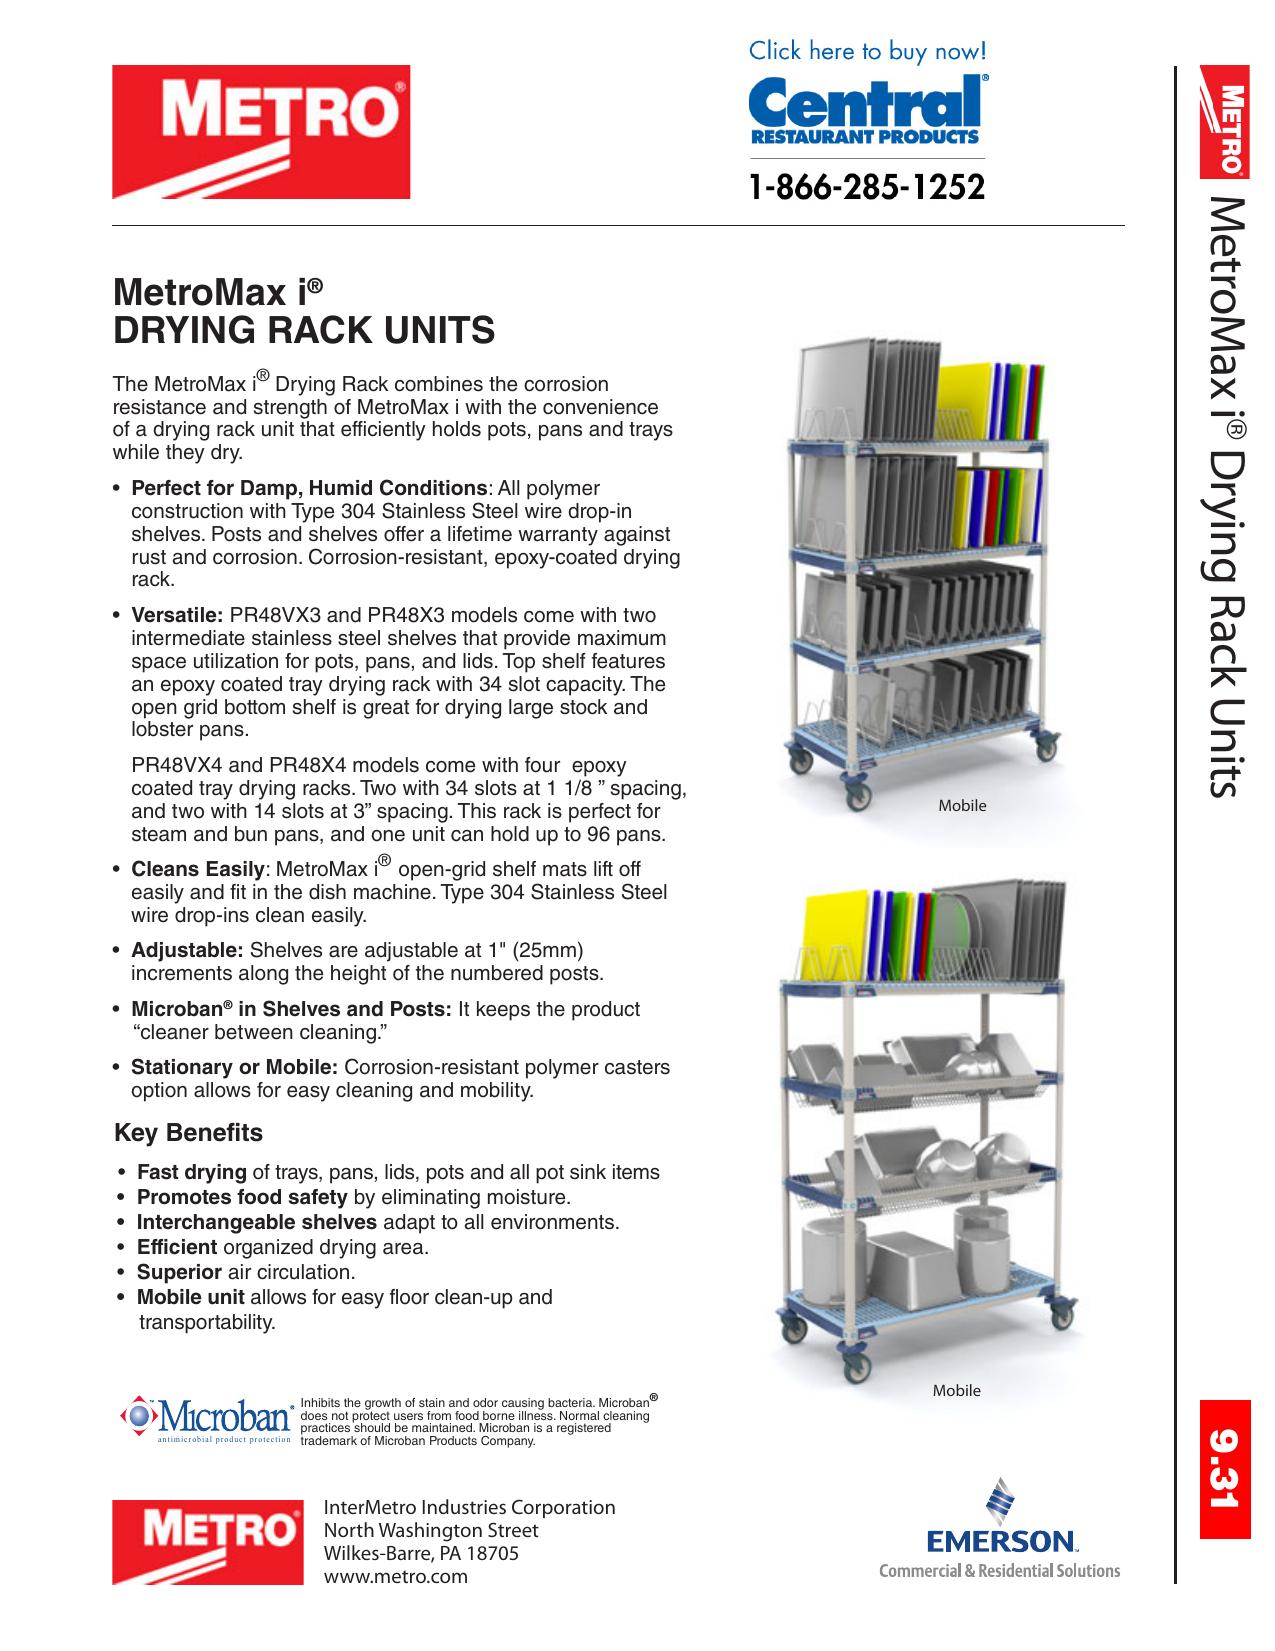 Metro Metromax I Drying Rack Units And Shelves Spec Sheet